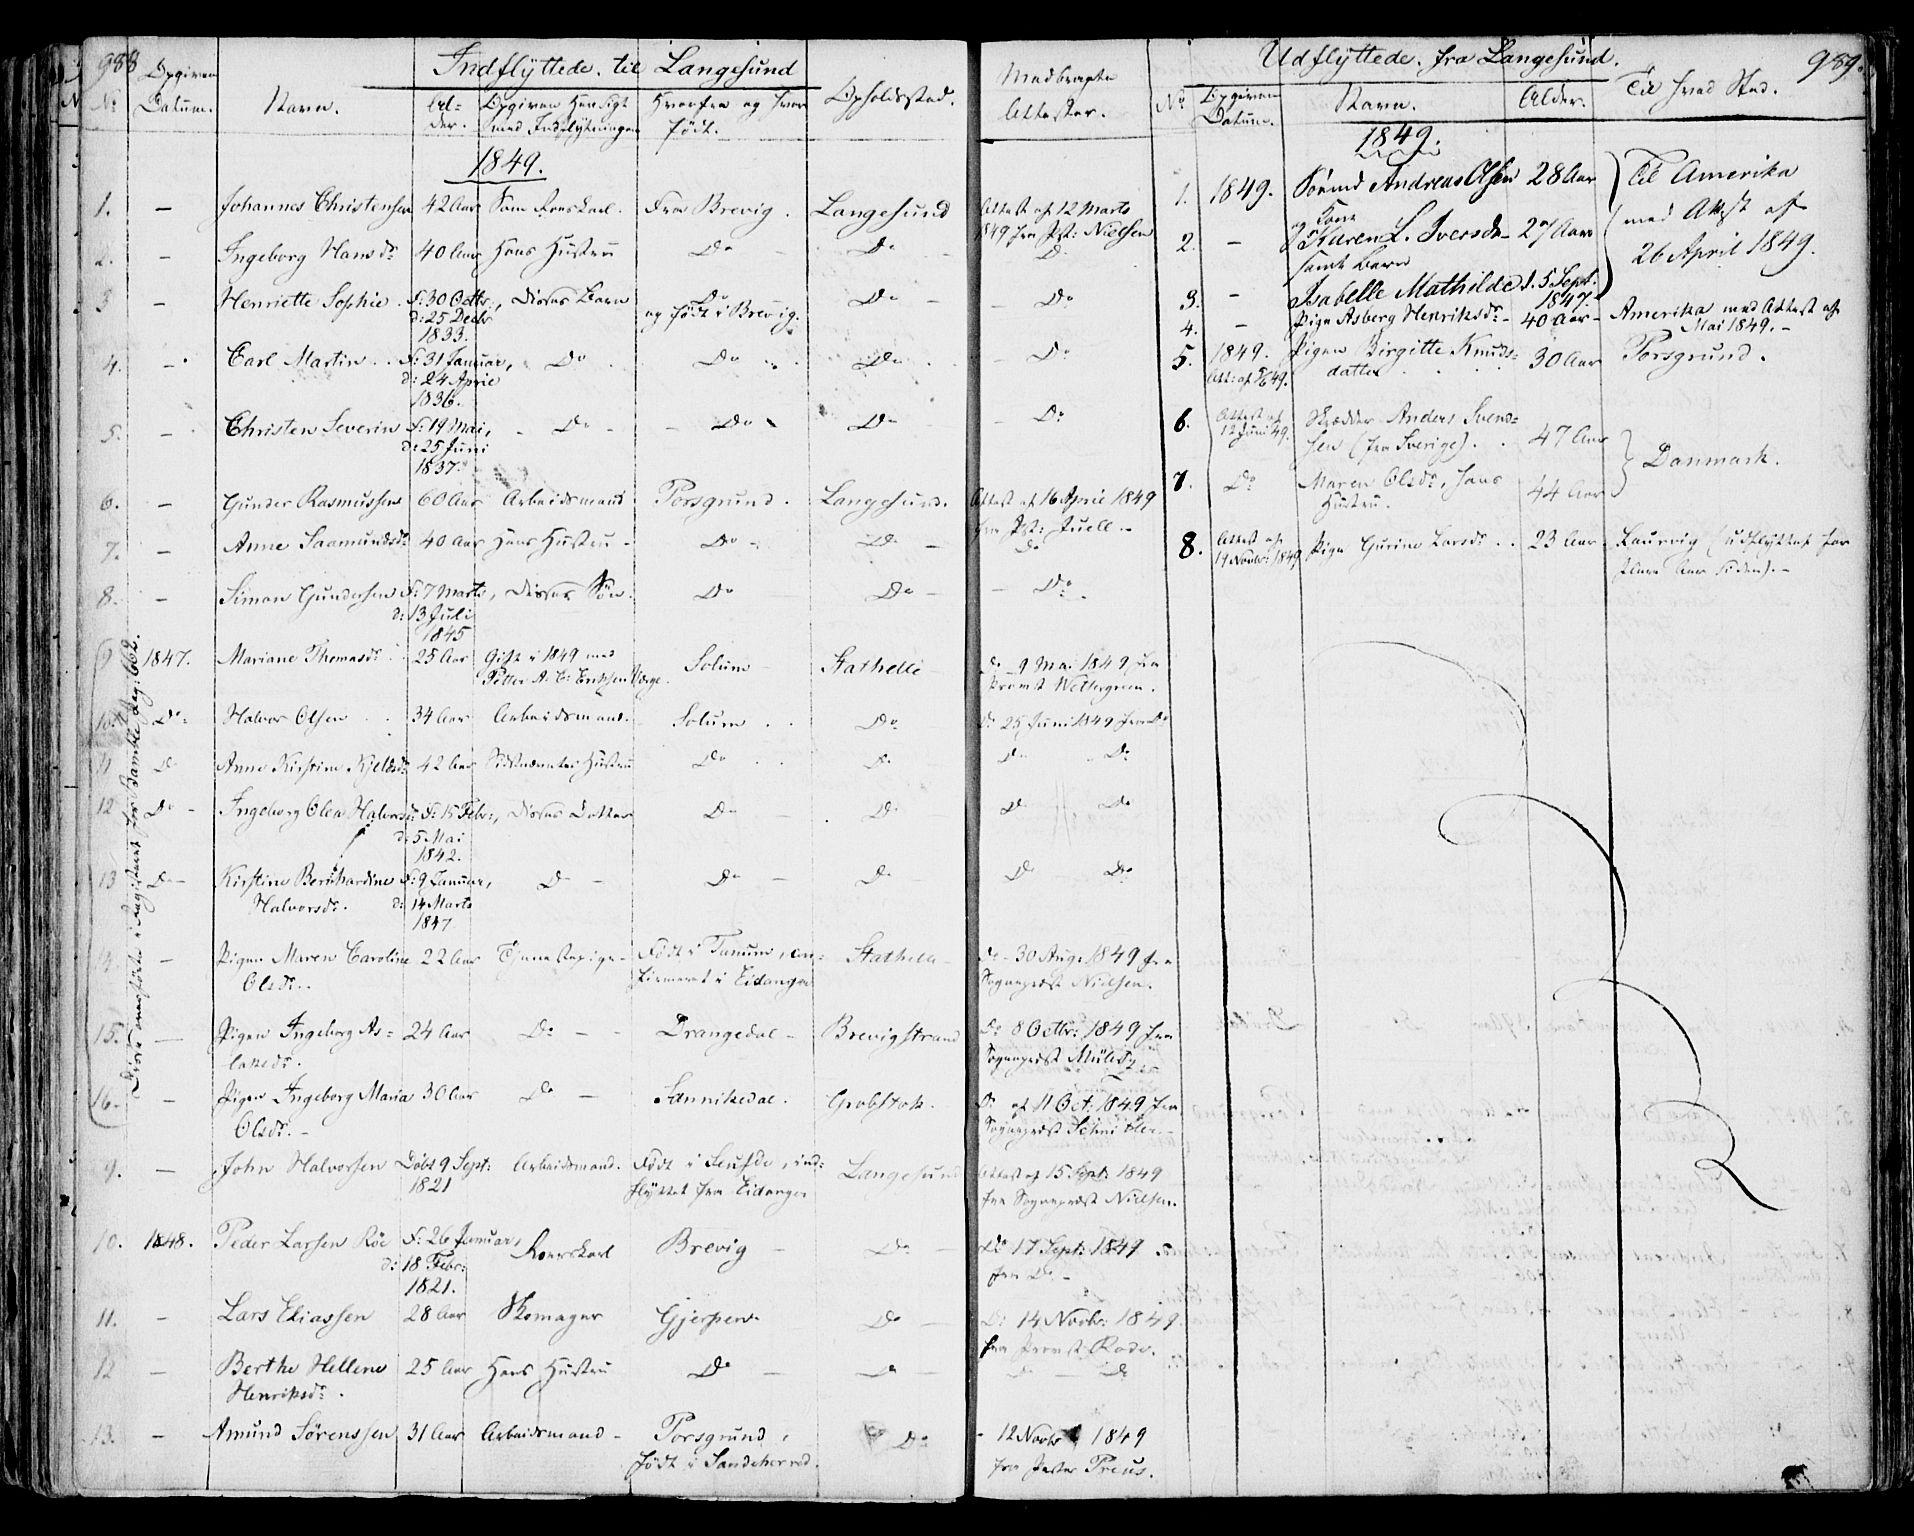 SAKO, Bamble kirkebøker, F/Fa/L0004: Ministerialbok nr. I 4, 1834-1853, s. 990-991